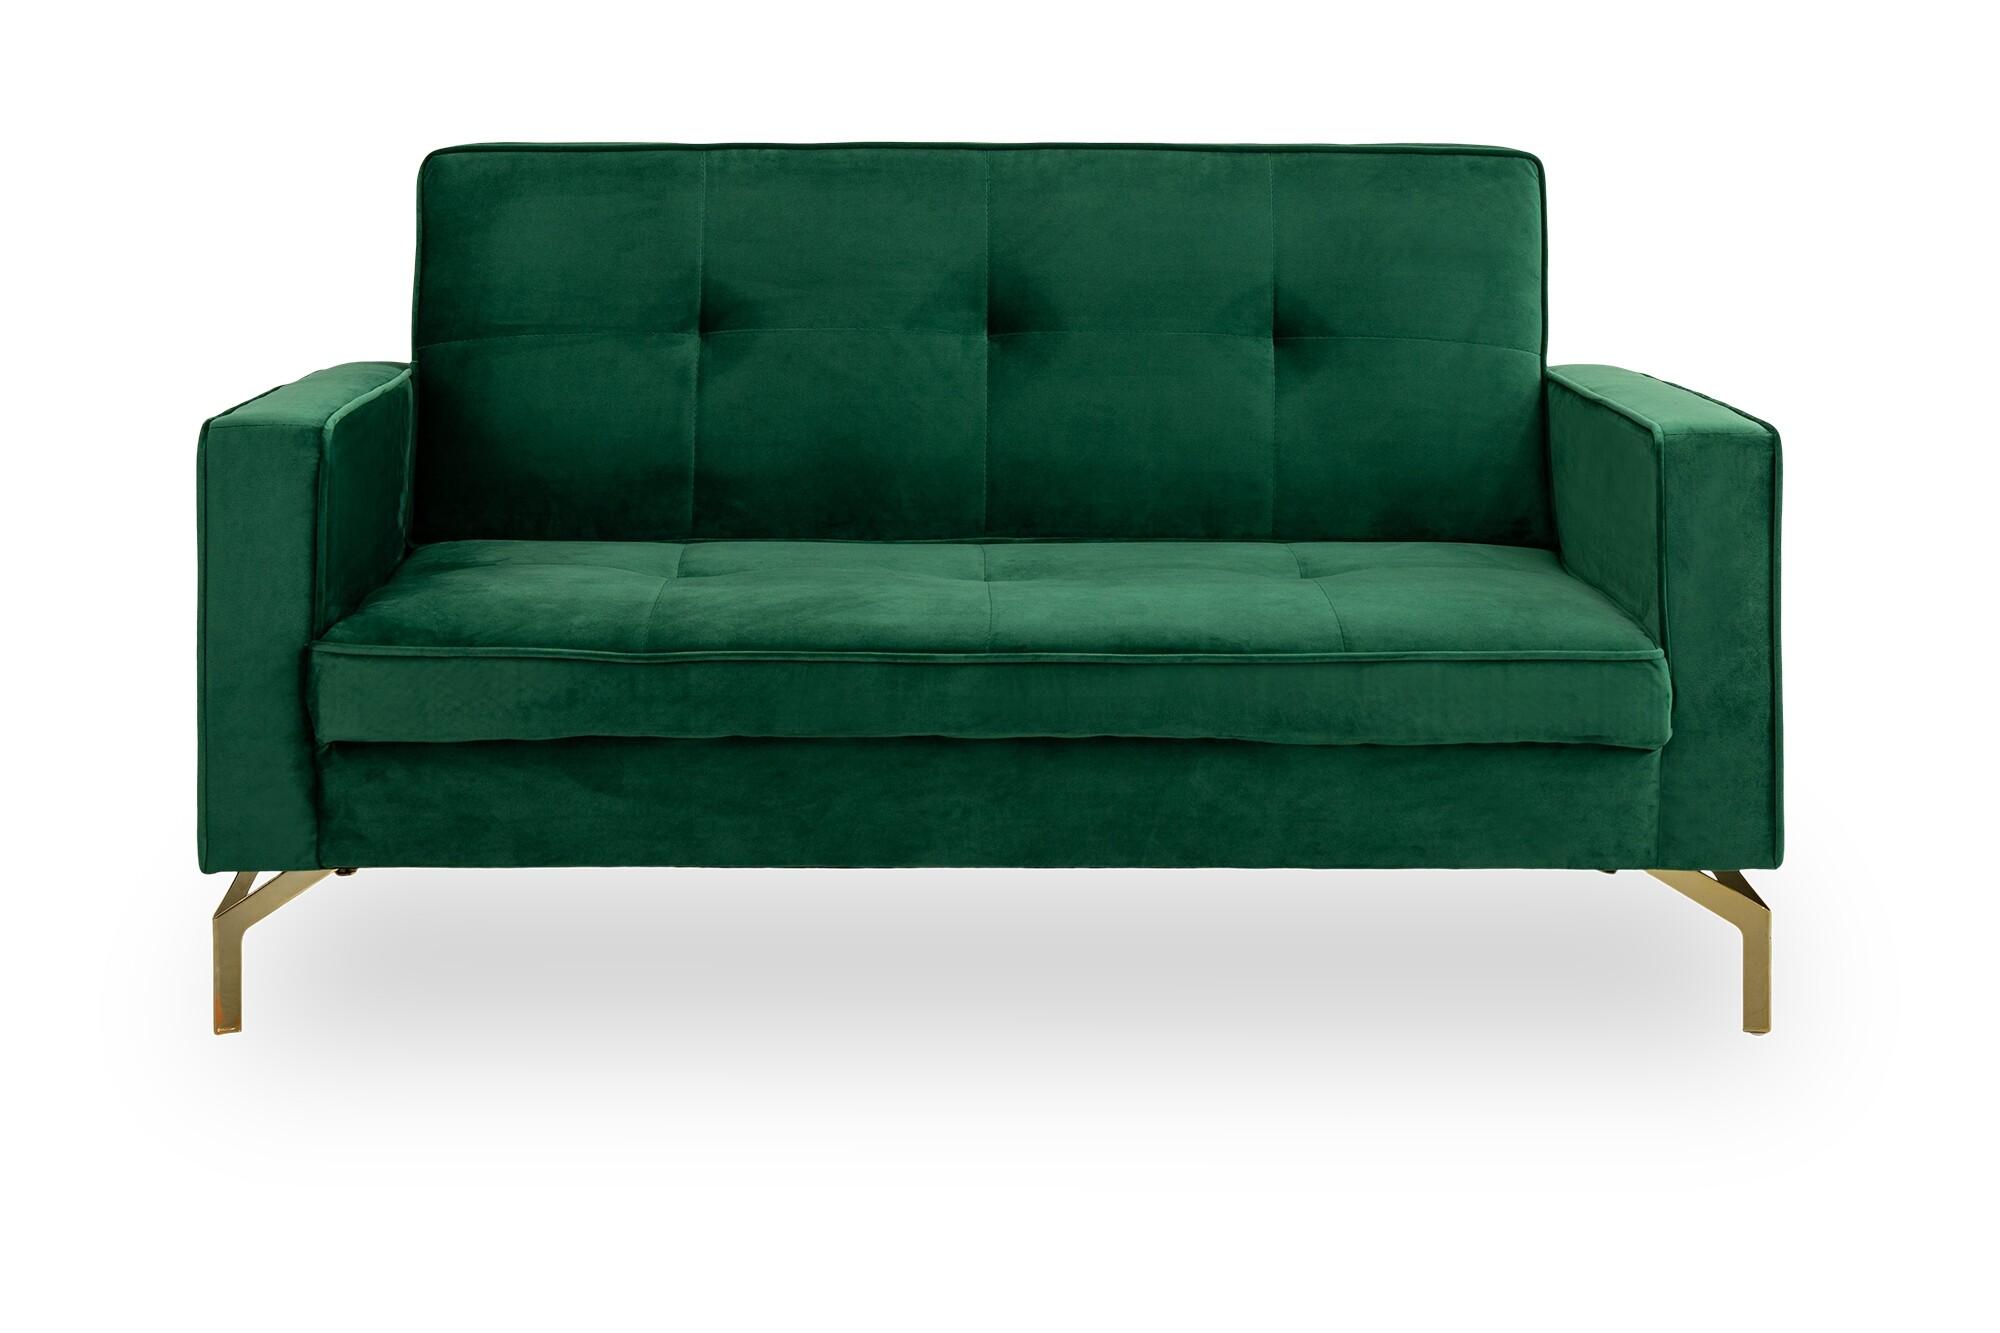 Easton 2 Seater Sofa Green